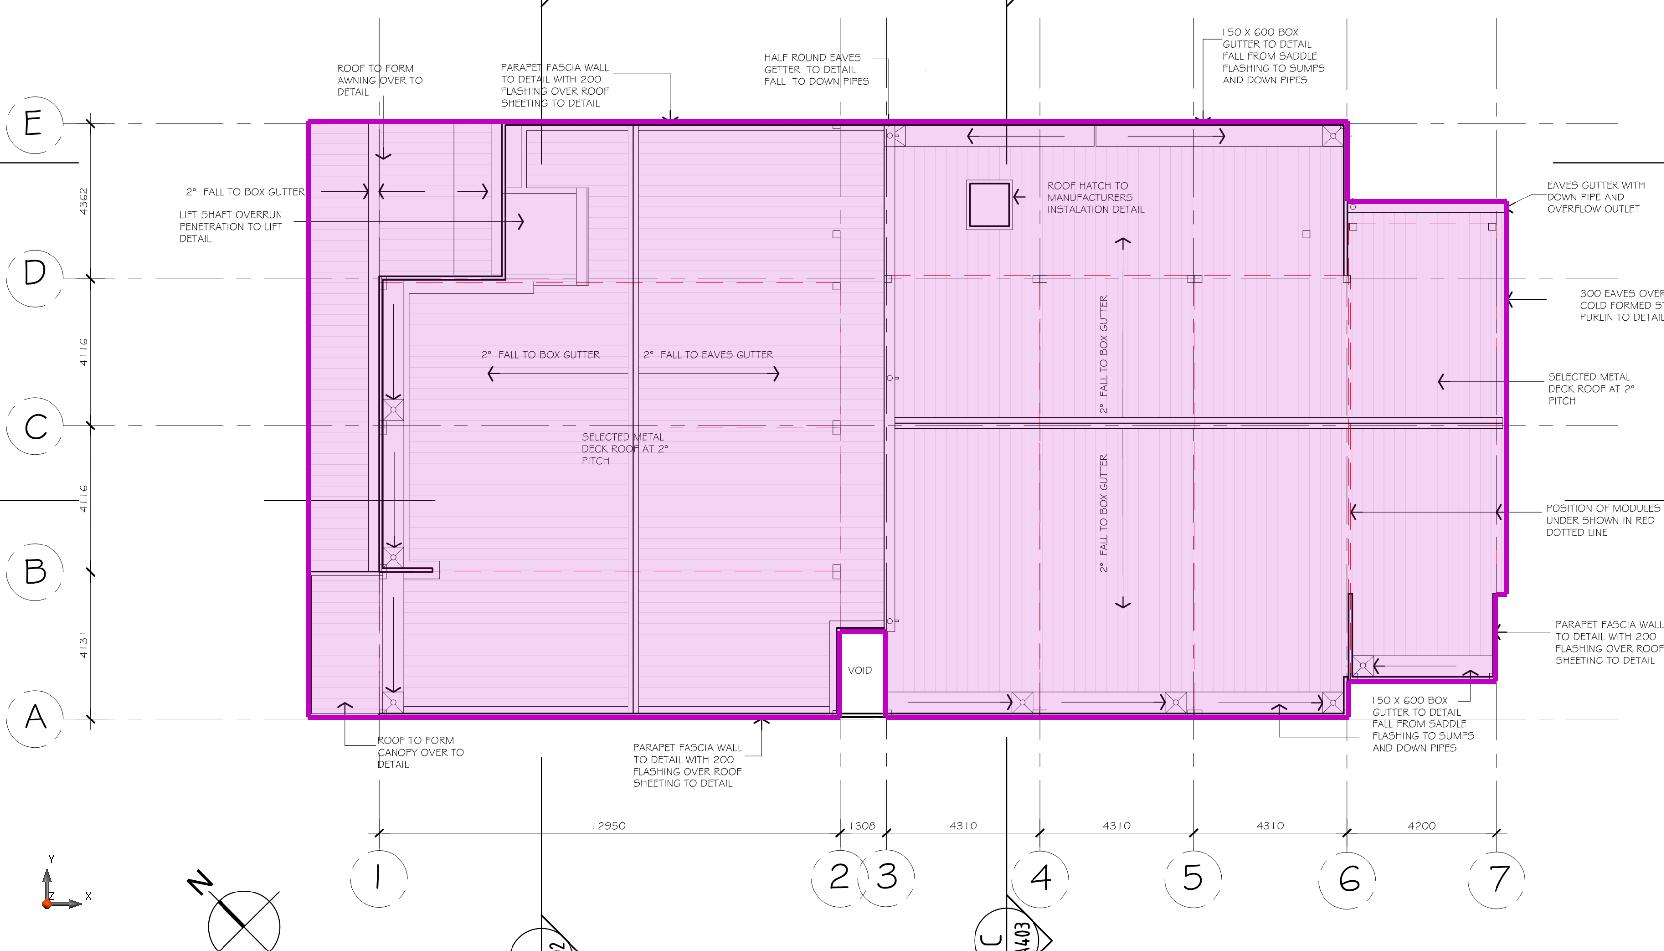 Sydney Estimating | Roof - Flat Area - Sydney Estimating